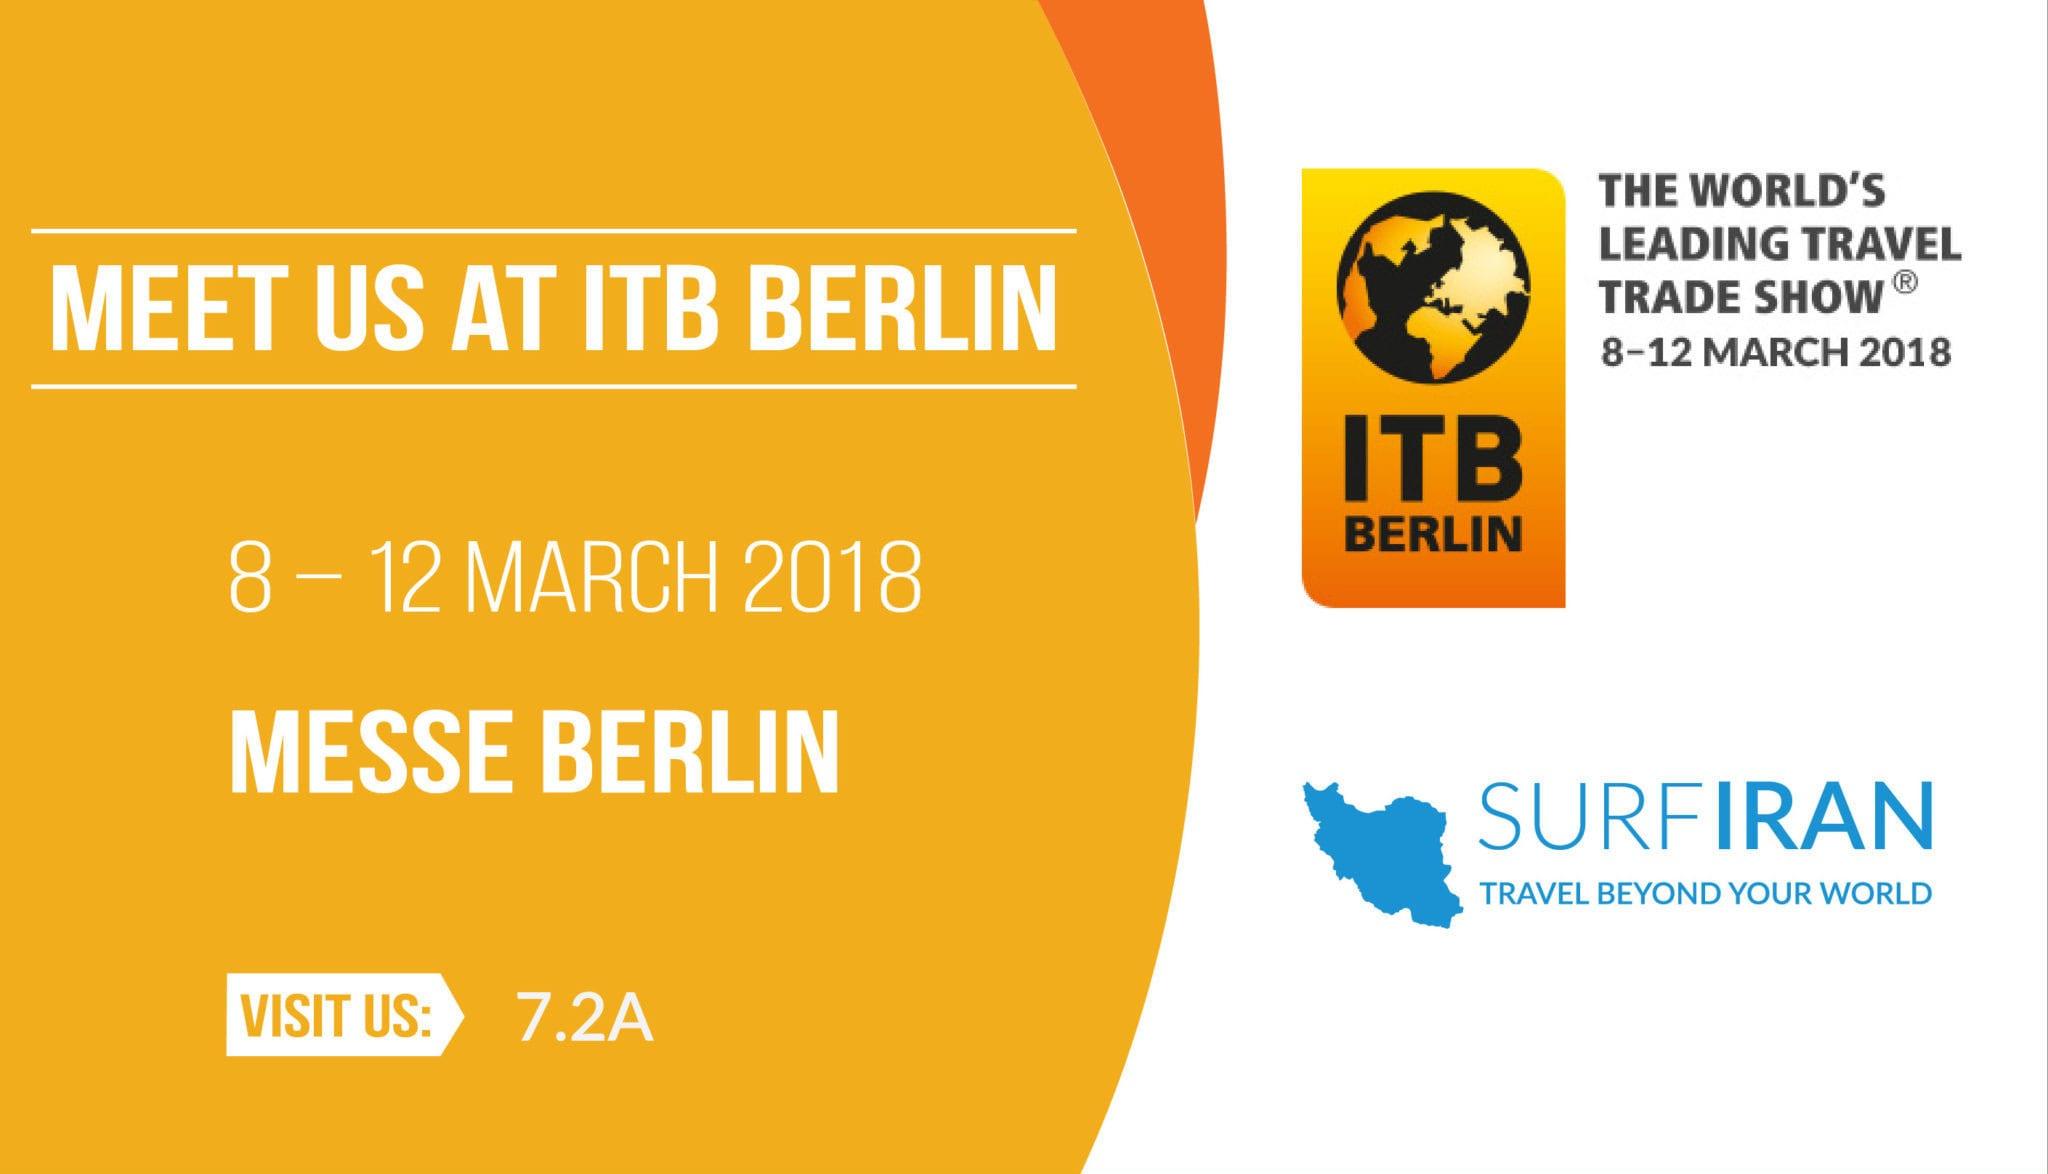 MEET SURFIRAN AT ITB BERLIN 2018